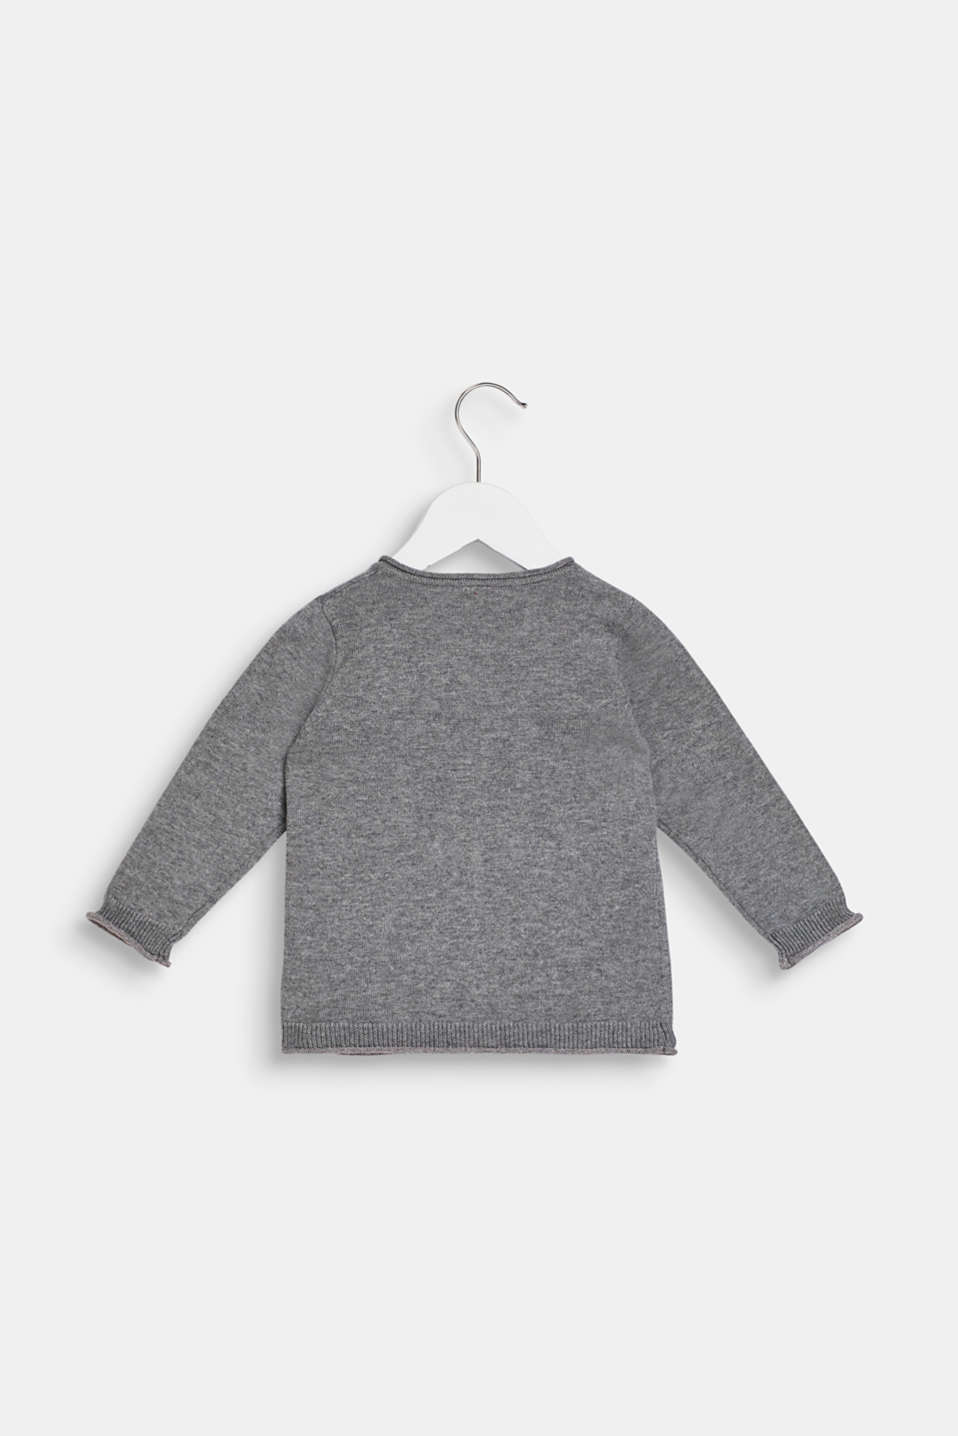 Polka dot-textured cardigan, 100% cotton, LCDARK HEATHER G, detail image number 1